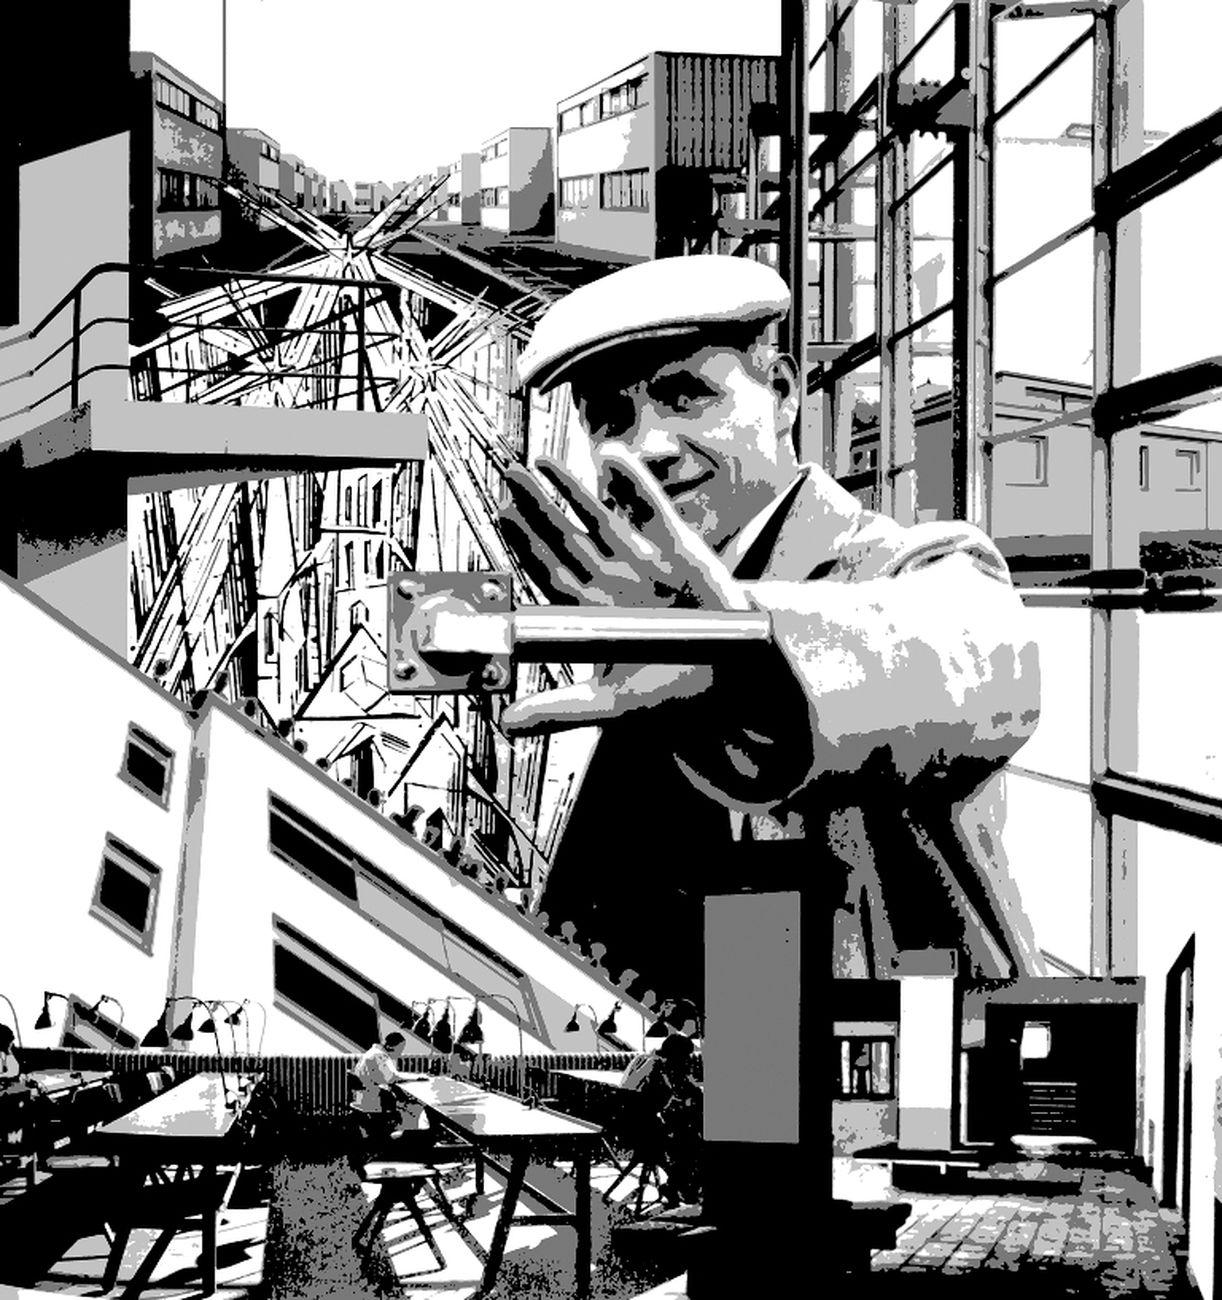 Bauhaus in 20 pictures, Bauhaus Week, 2019. Berlin. Courtesy Kultuprojekte Berlin